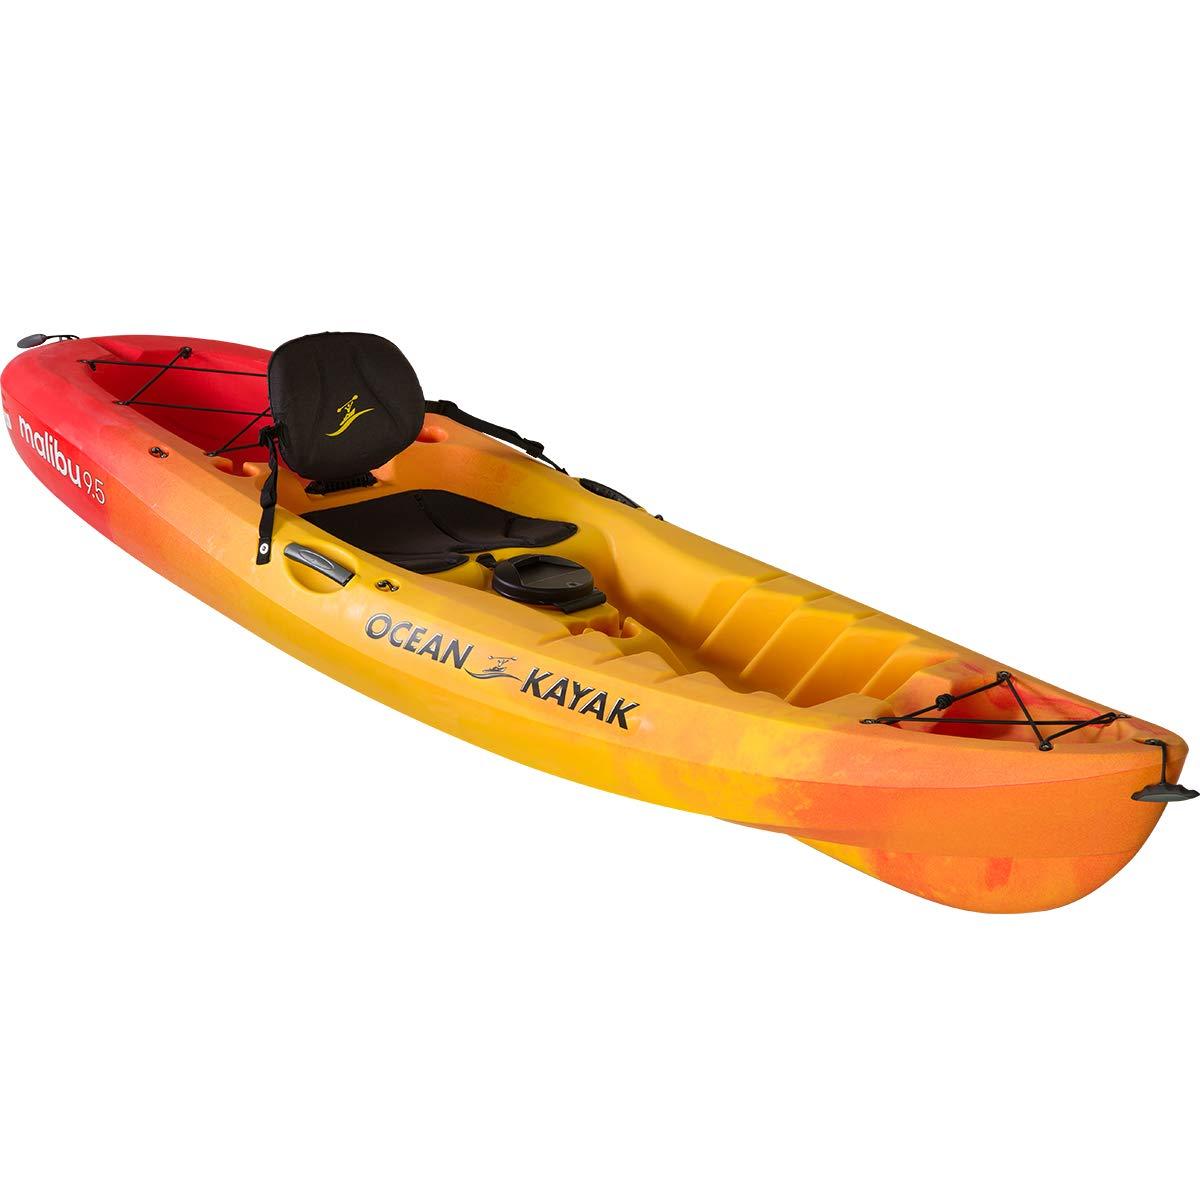 Ocean Kayak Malibu 9.5 Kayak (Sunrise, 9 Feet 5 Inches) by Ocean Kayak